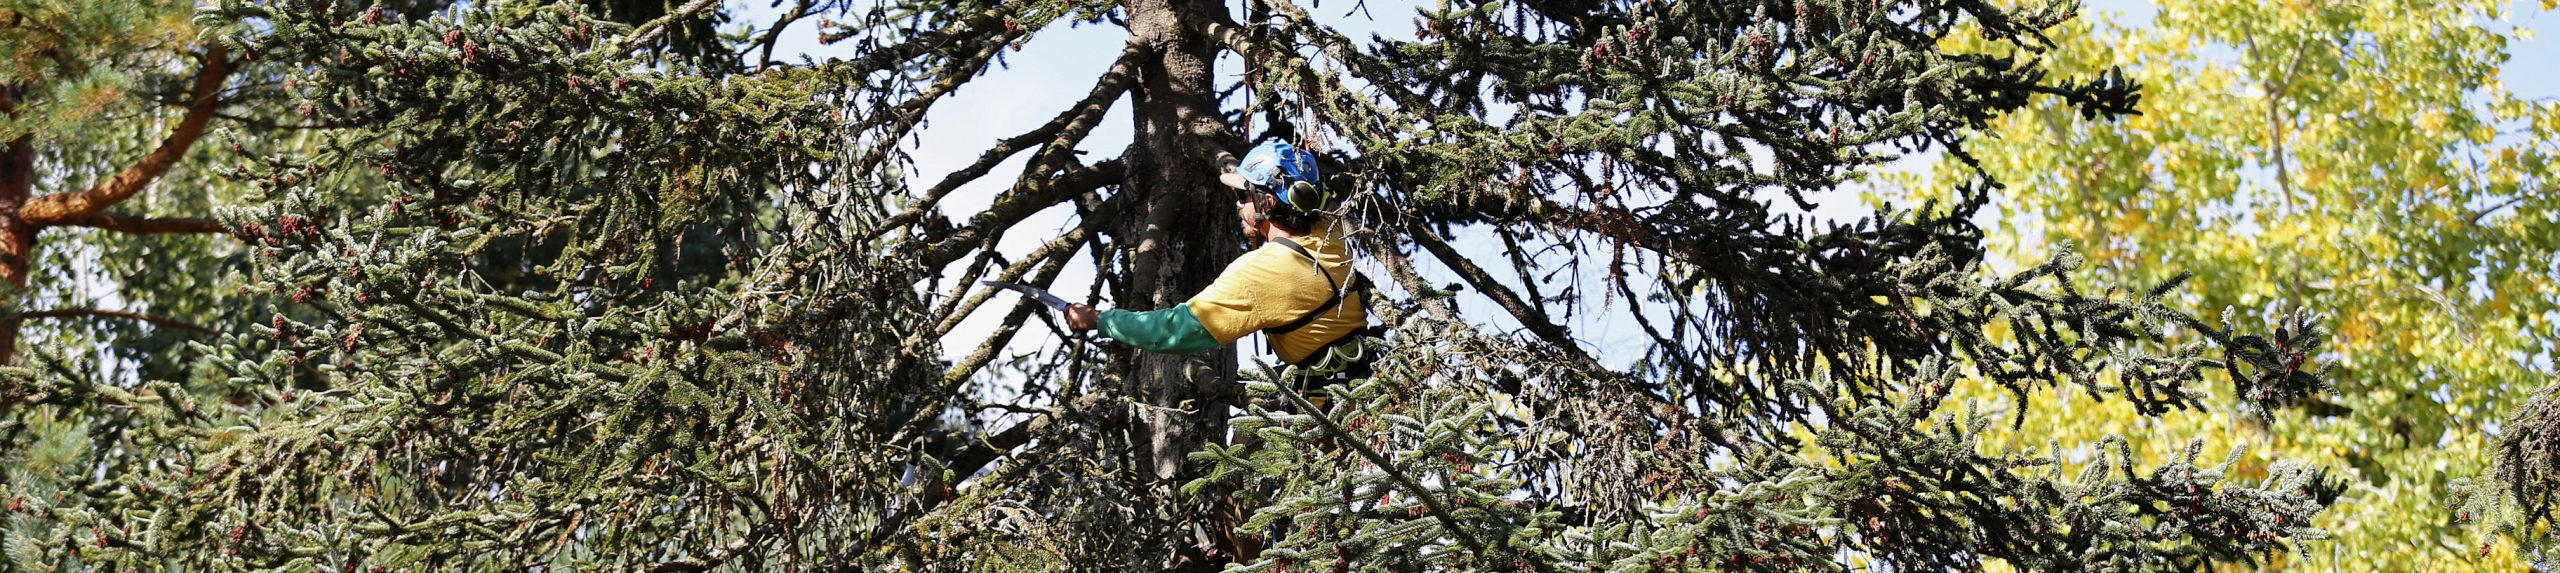 Arborist Partner Program